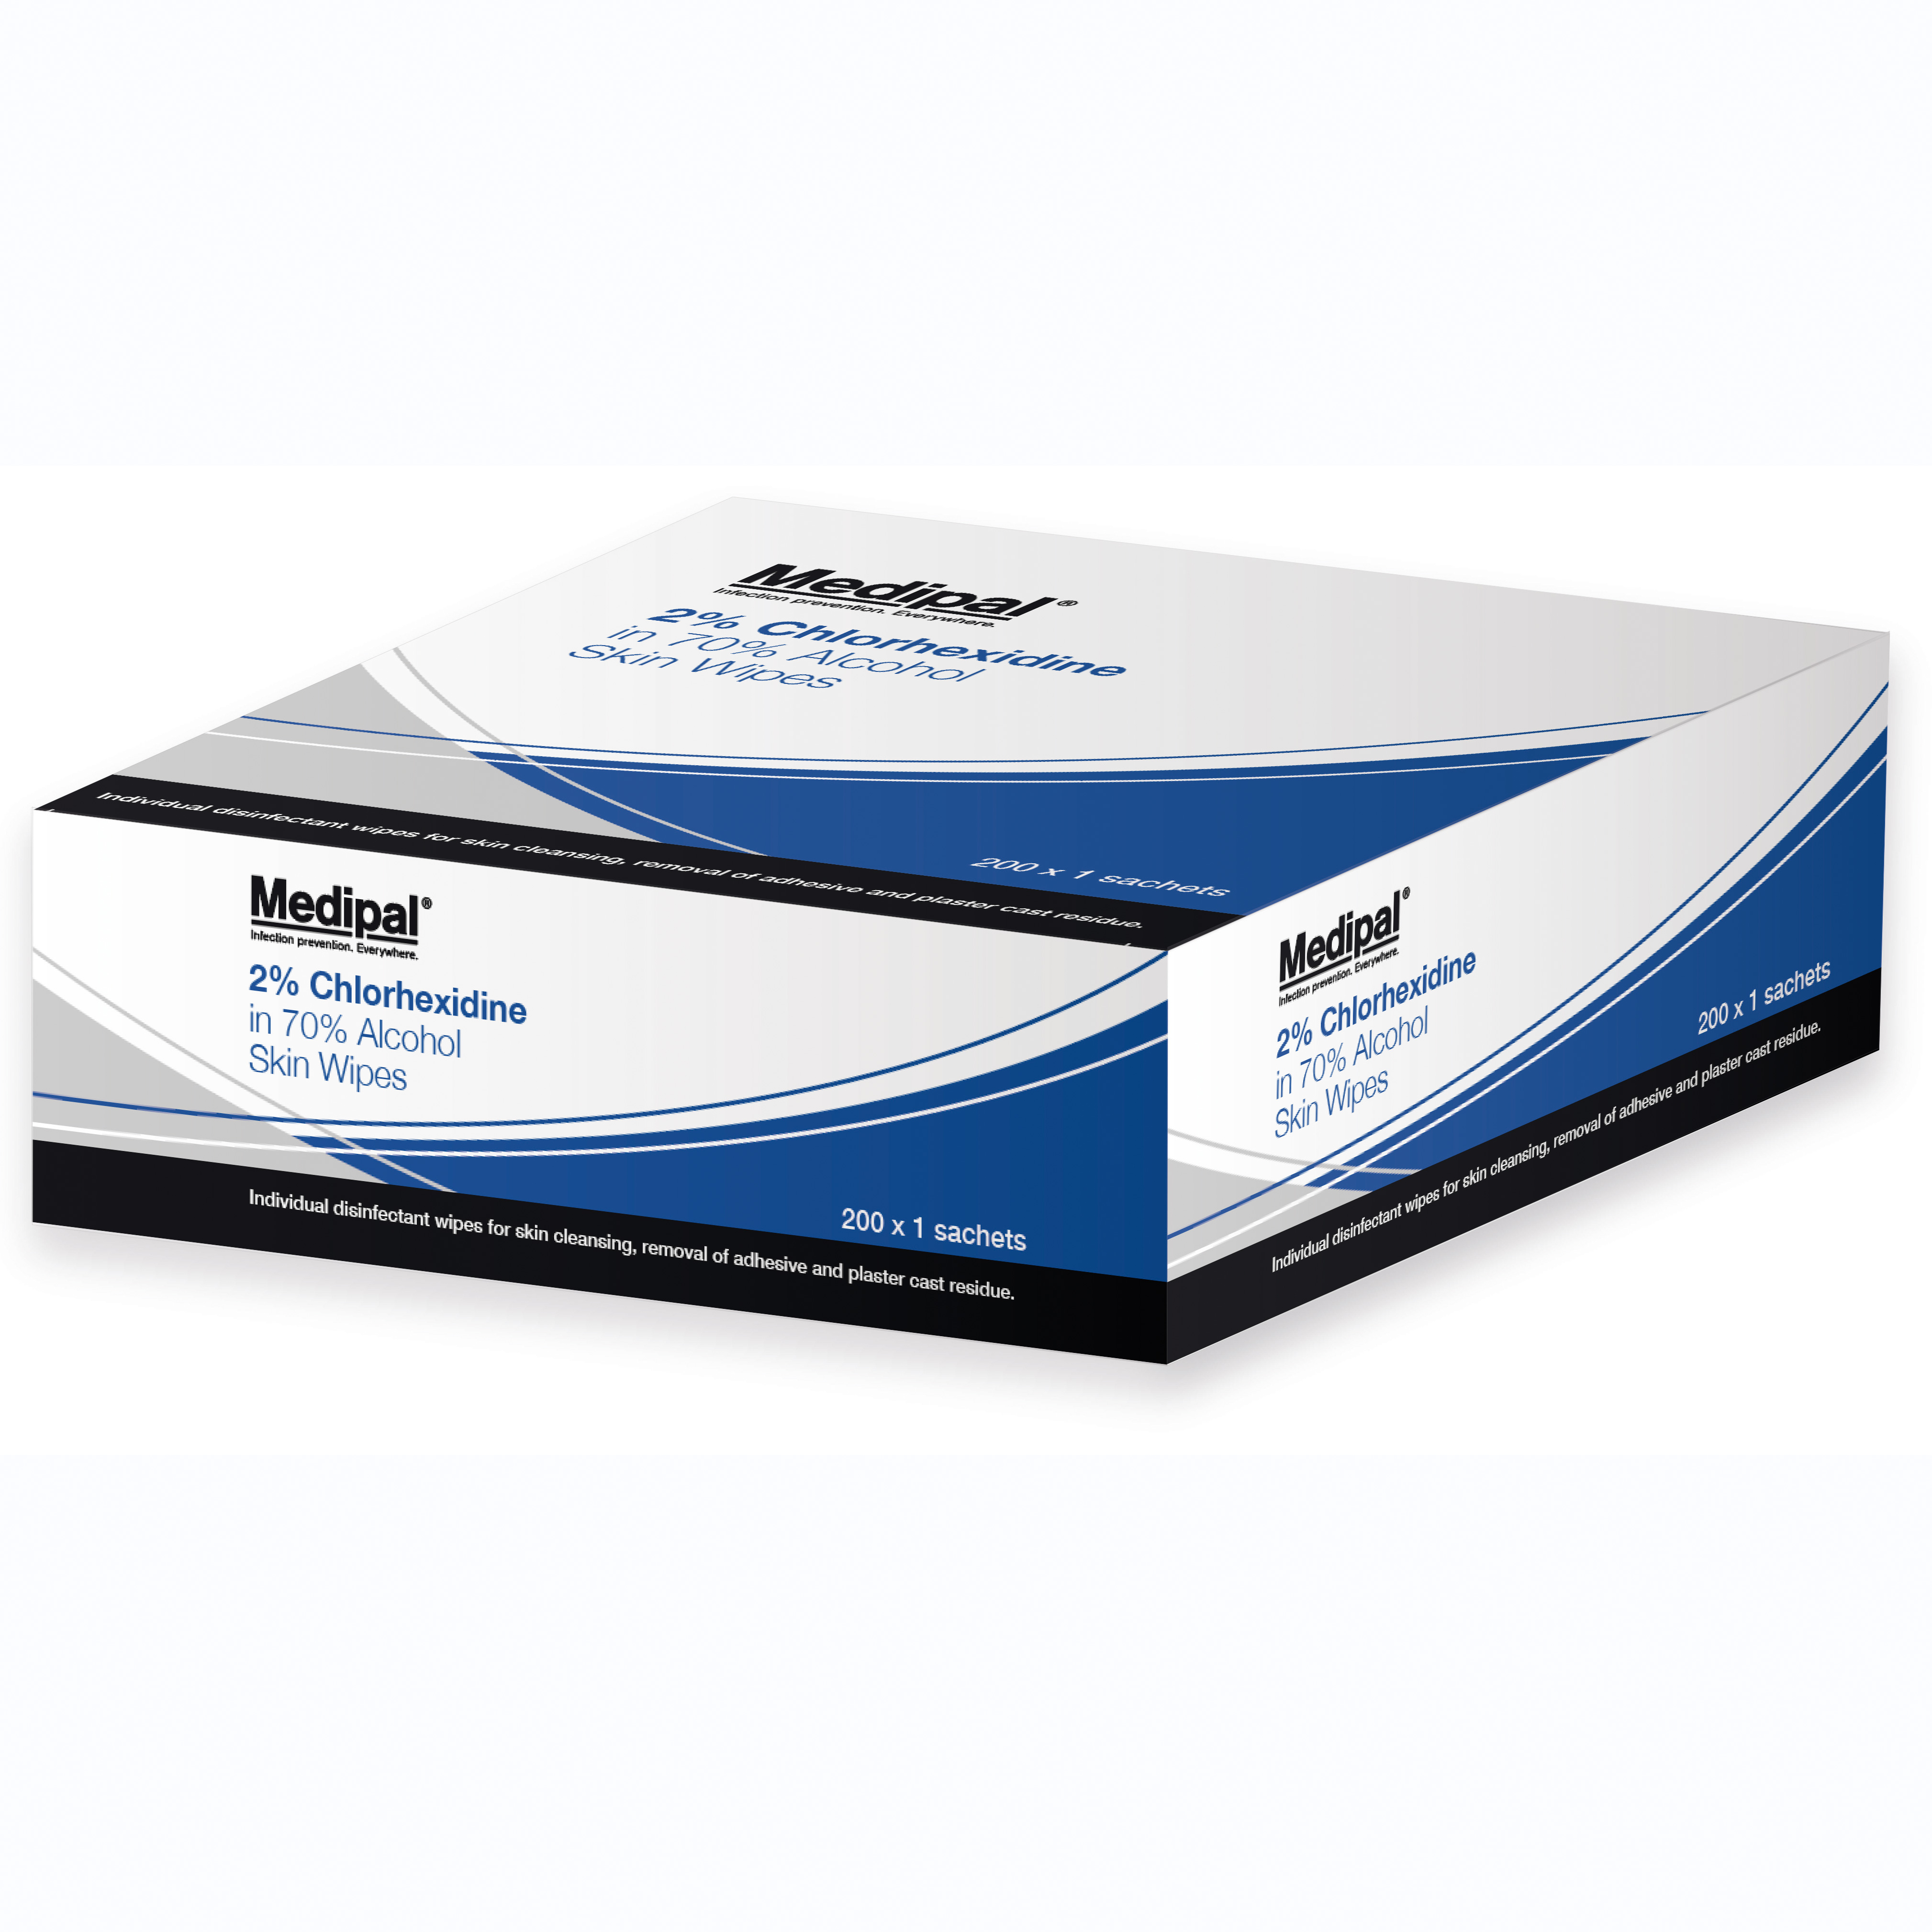 Medipal Chlorhexidine Skin Wipes Bx200